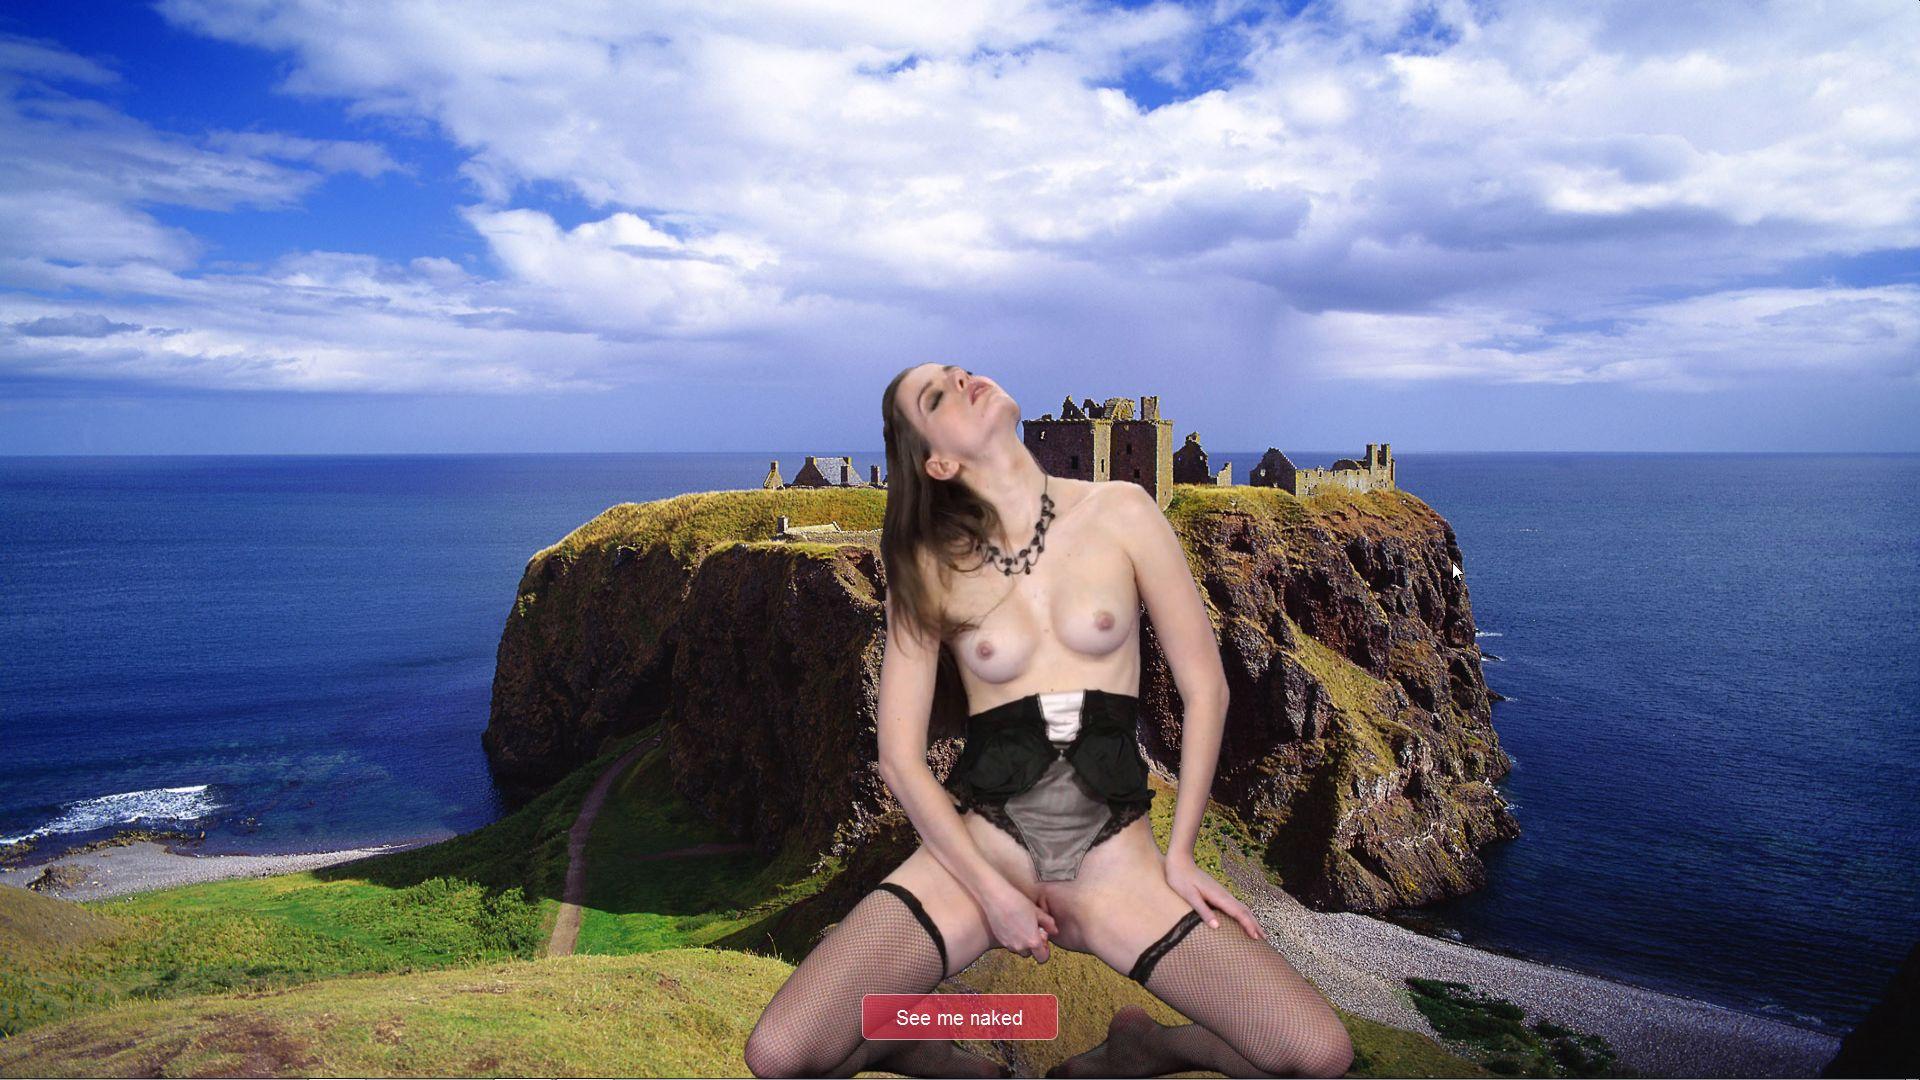 francine prieto vagina porn photos